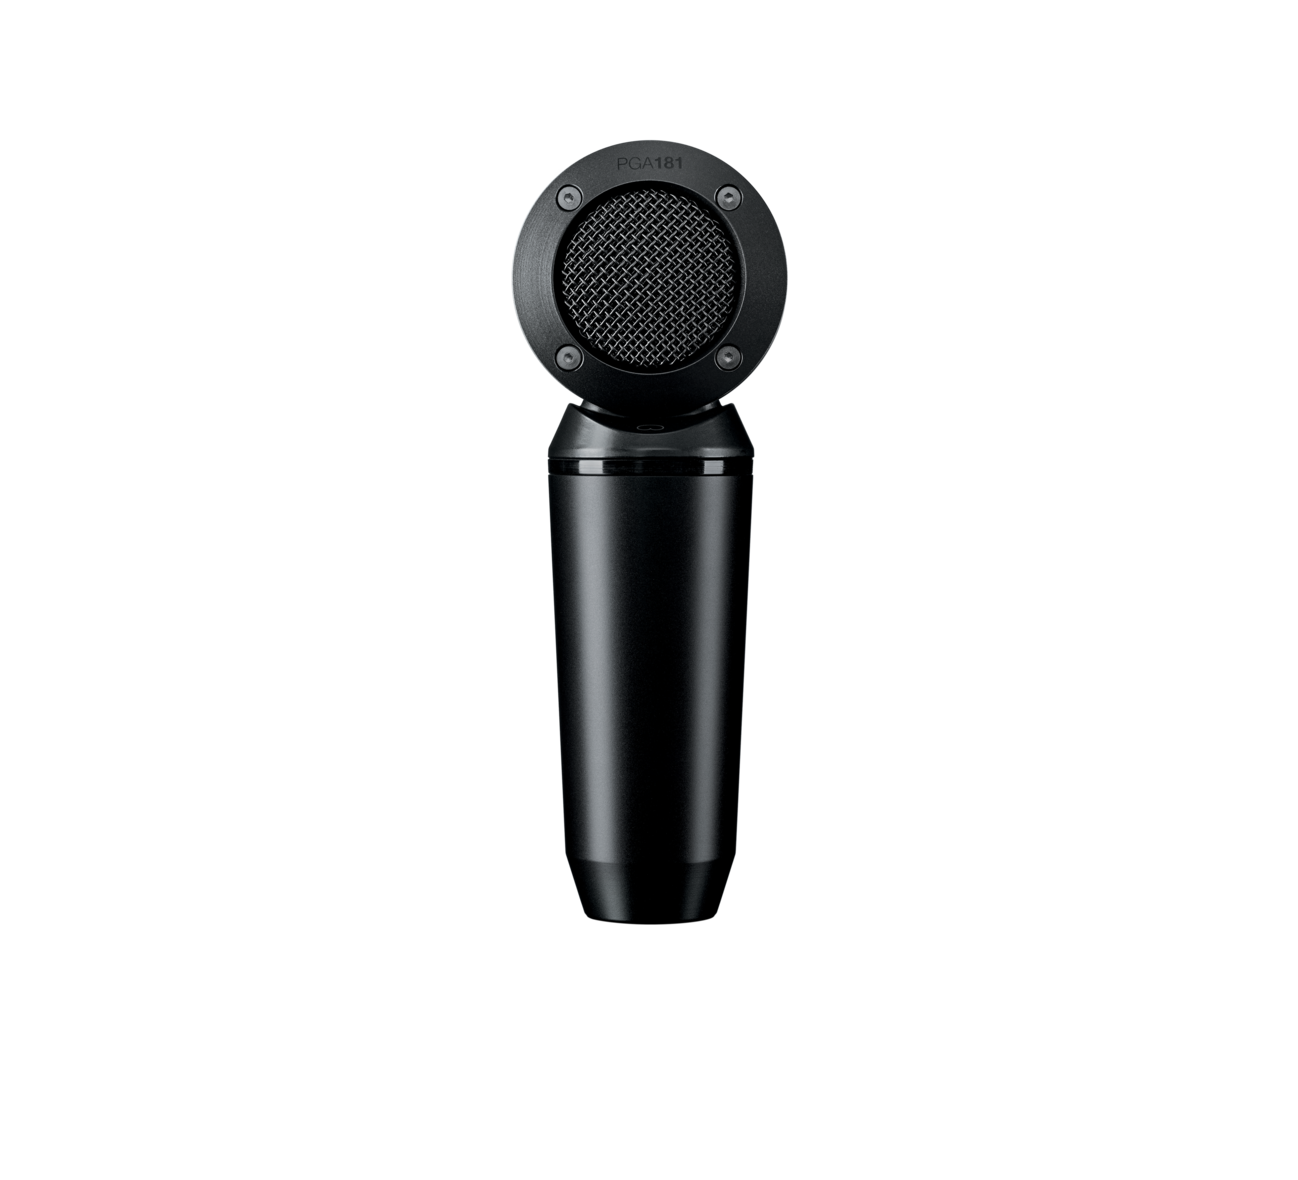 Shure PGA181 Kondensatormikrofon im Lollipop-Design inklusive Kabel